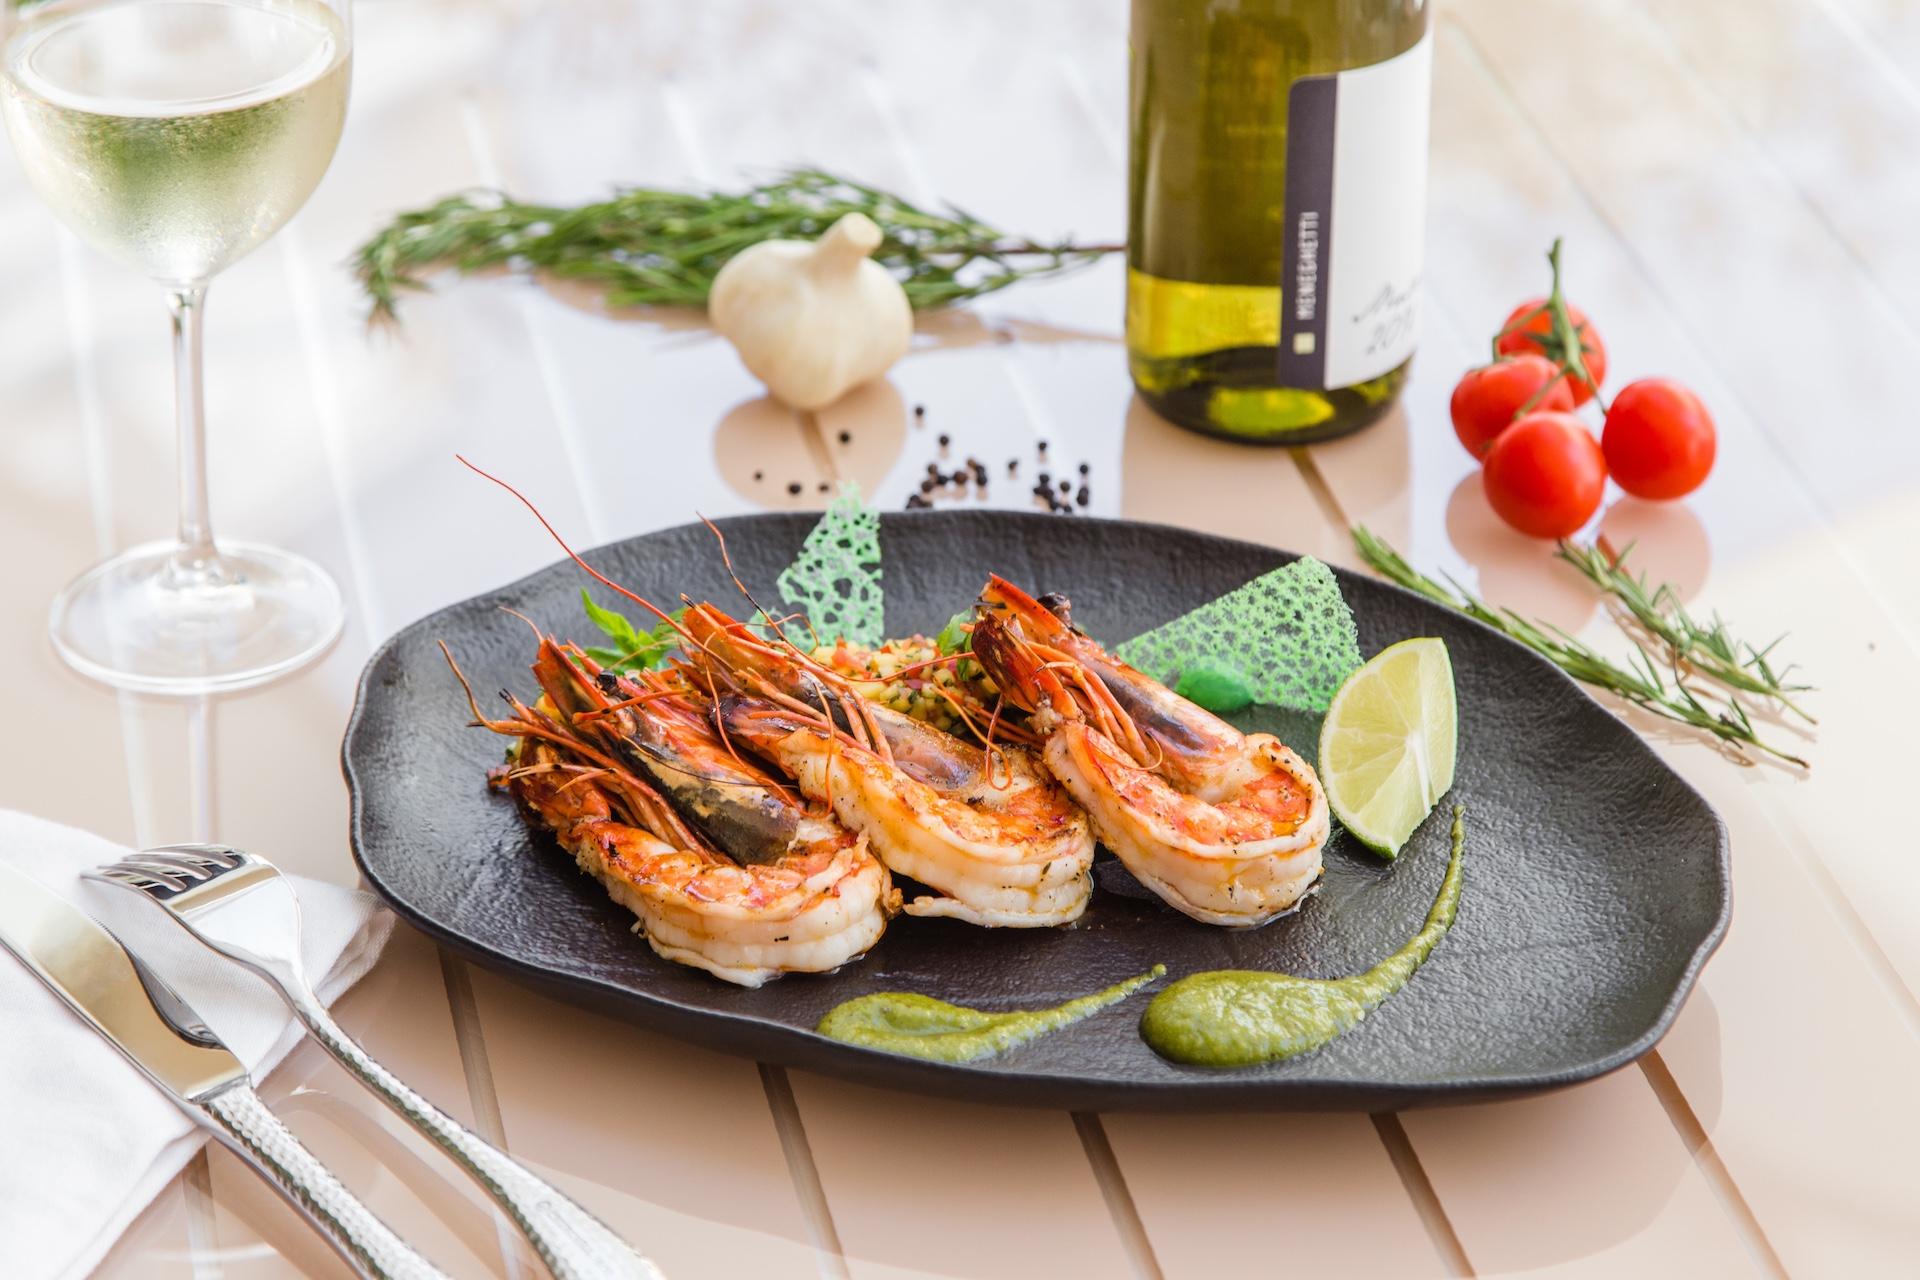 Restaurant Anatolia lounge cafe becici montenegro budva poll 8.jpeg